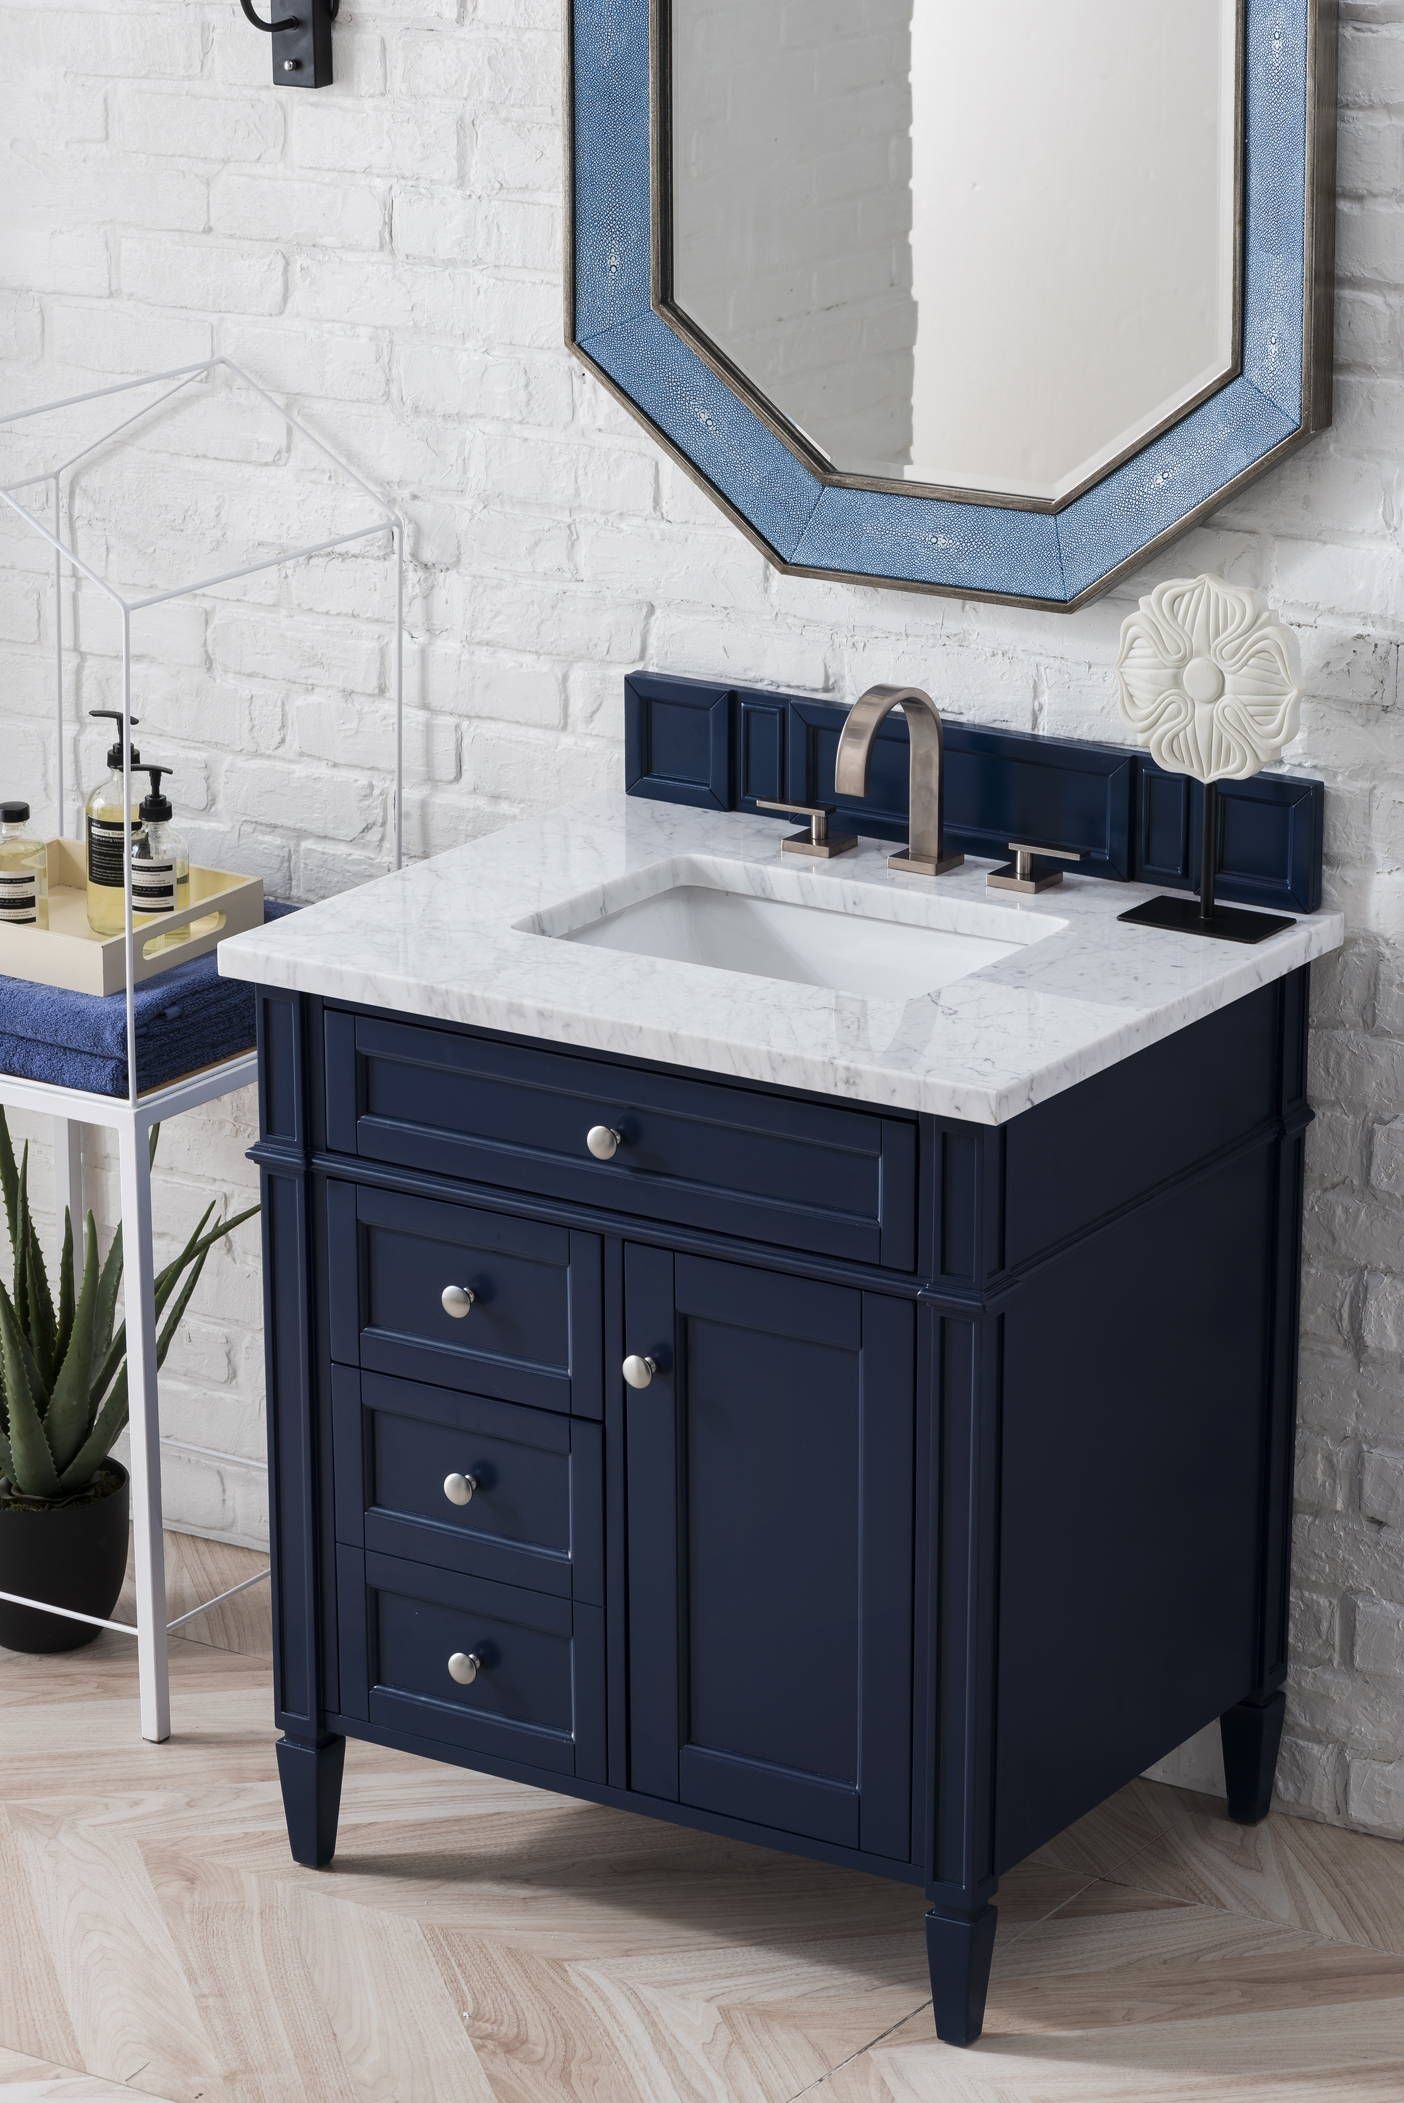 Brittany 30 Single Vanity Victory Blue In 2020 Single Bathroom